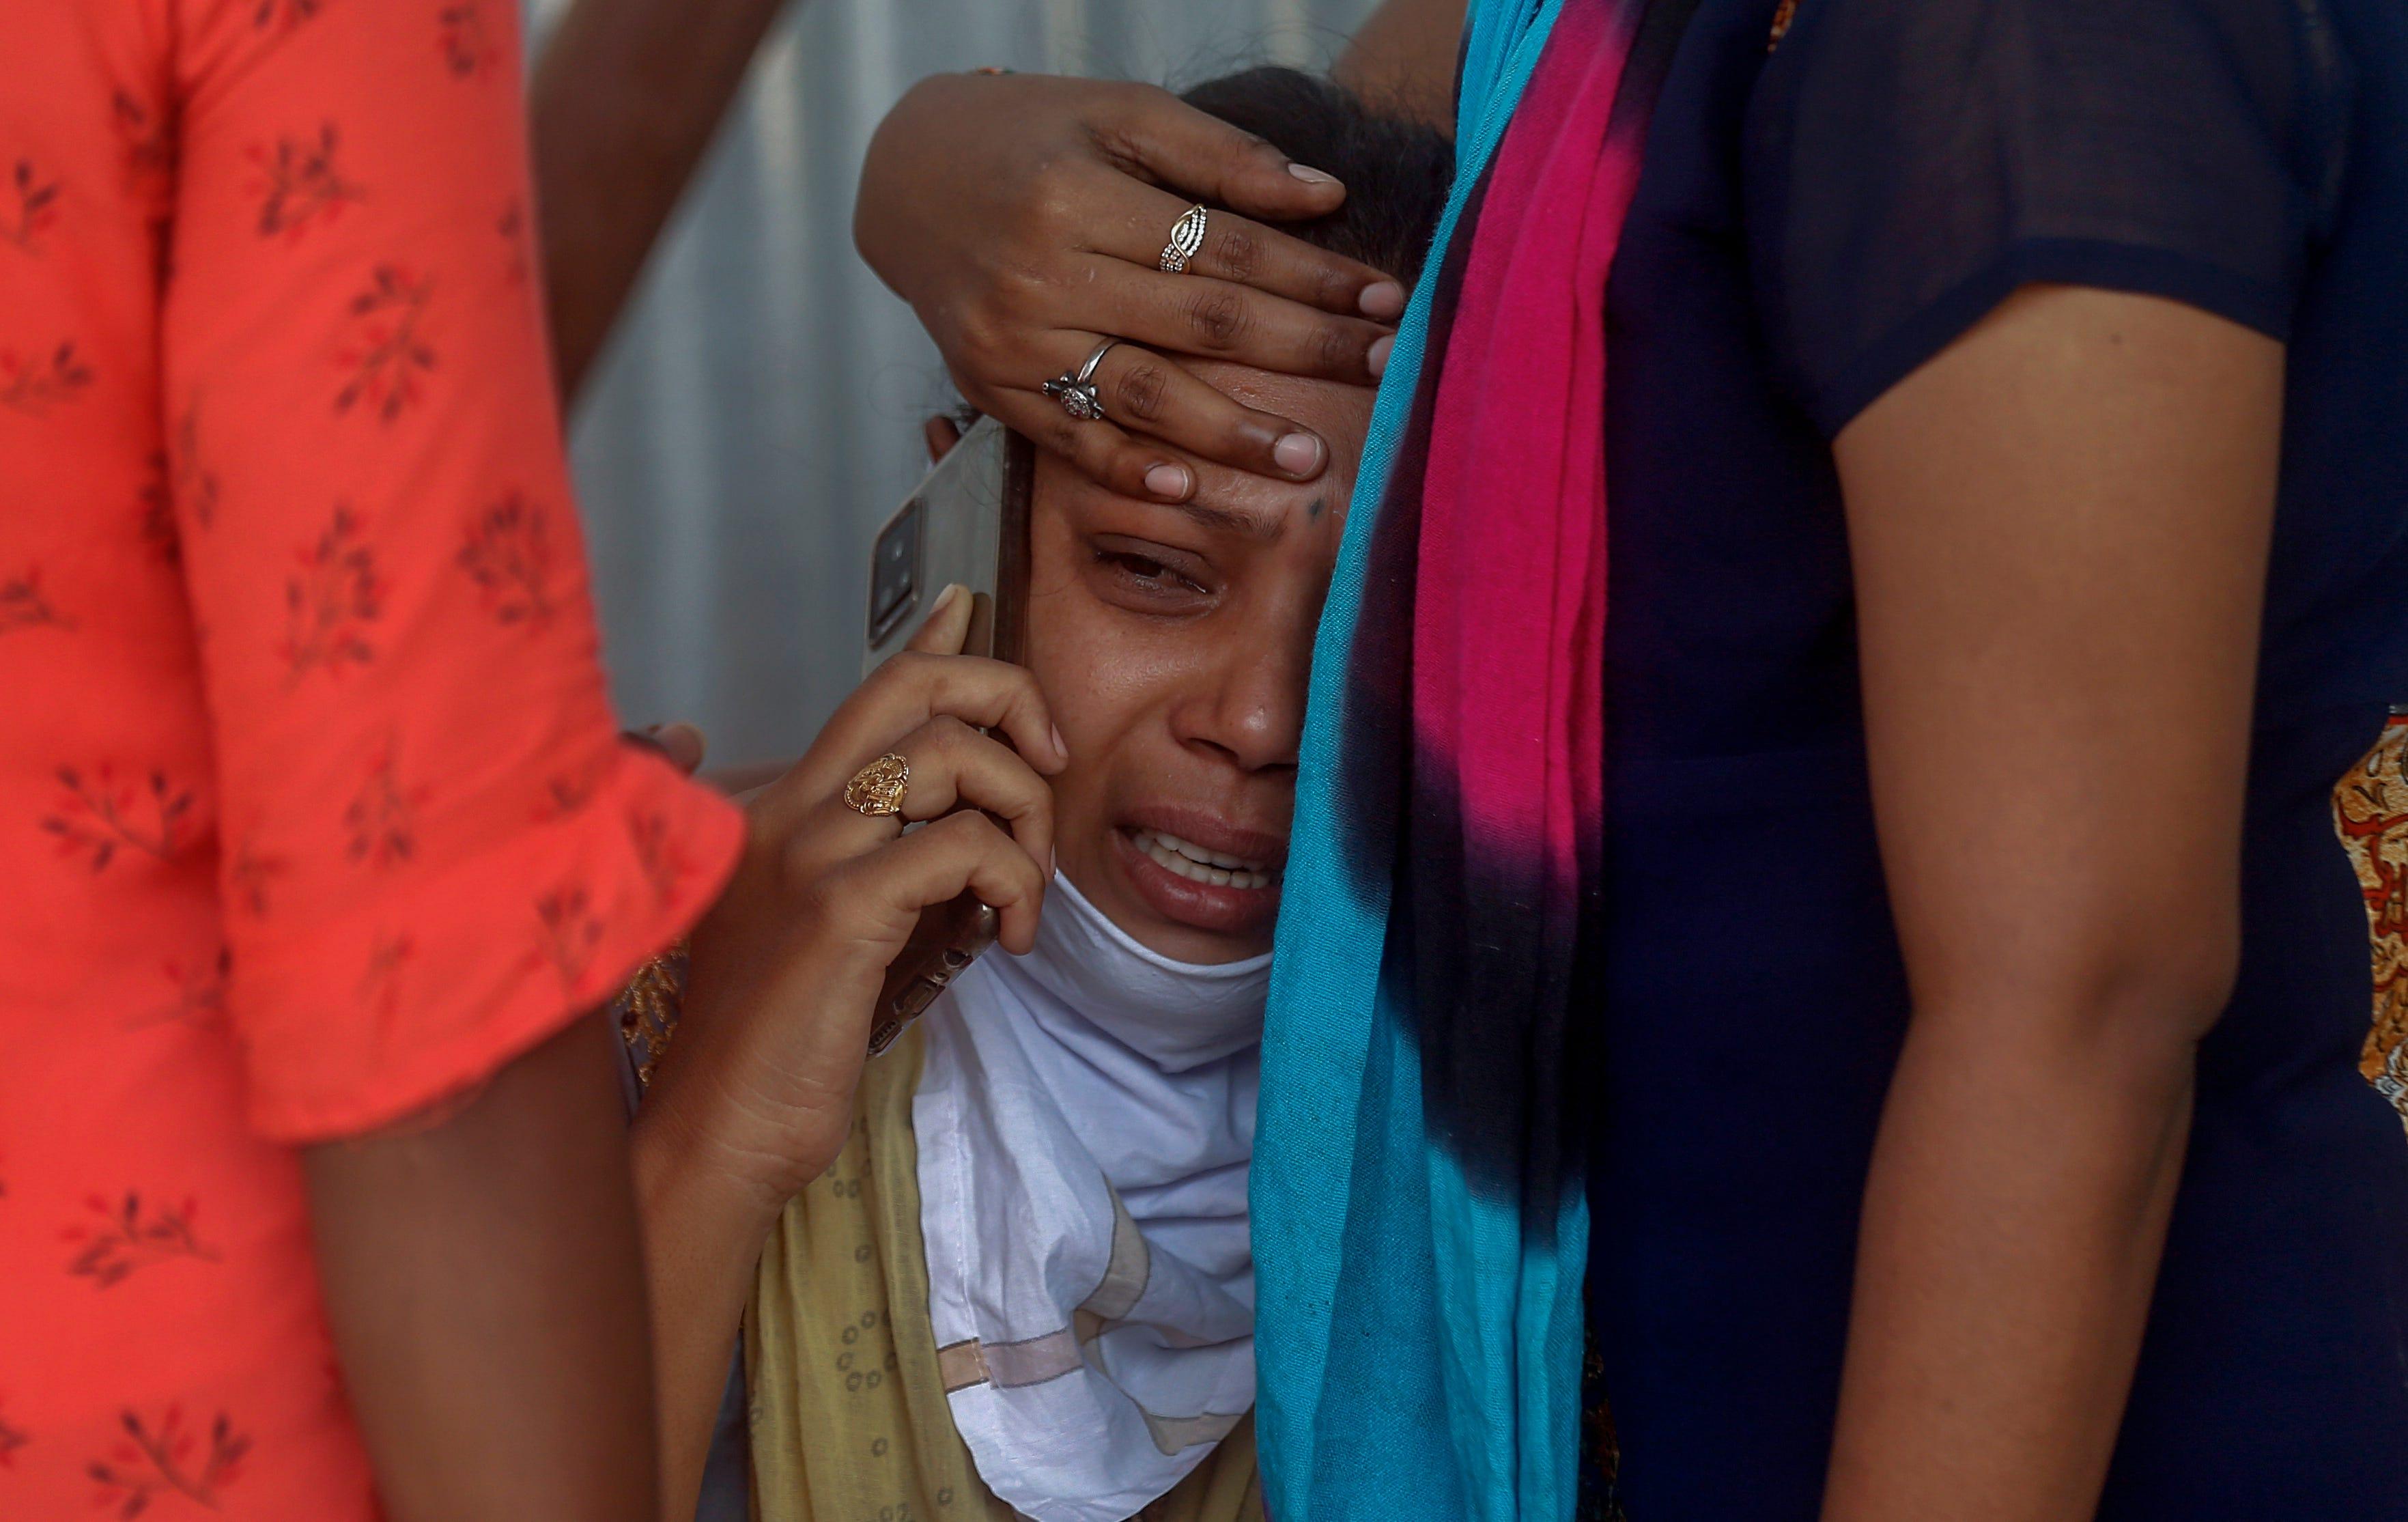 India tops 20 million cases amid warning of 'horrible' weeks ahead 2